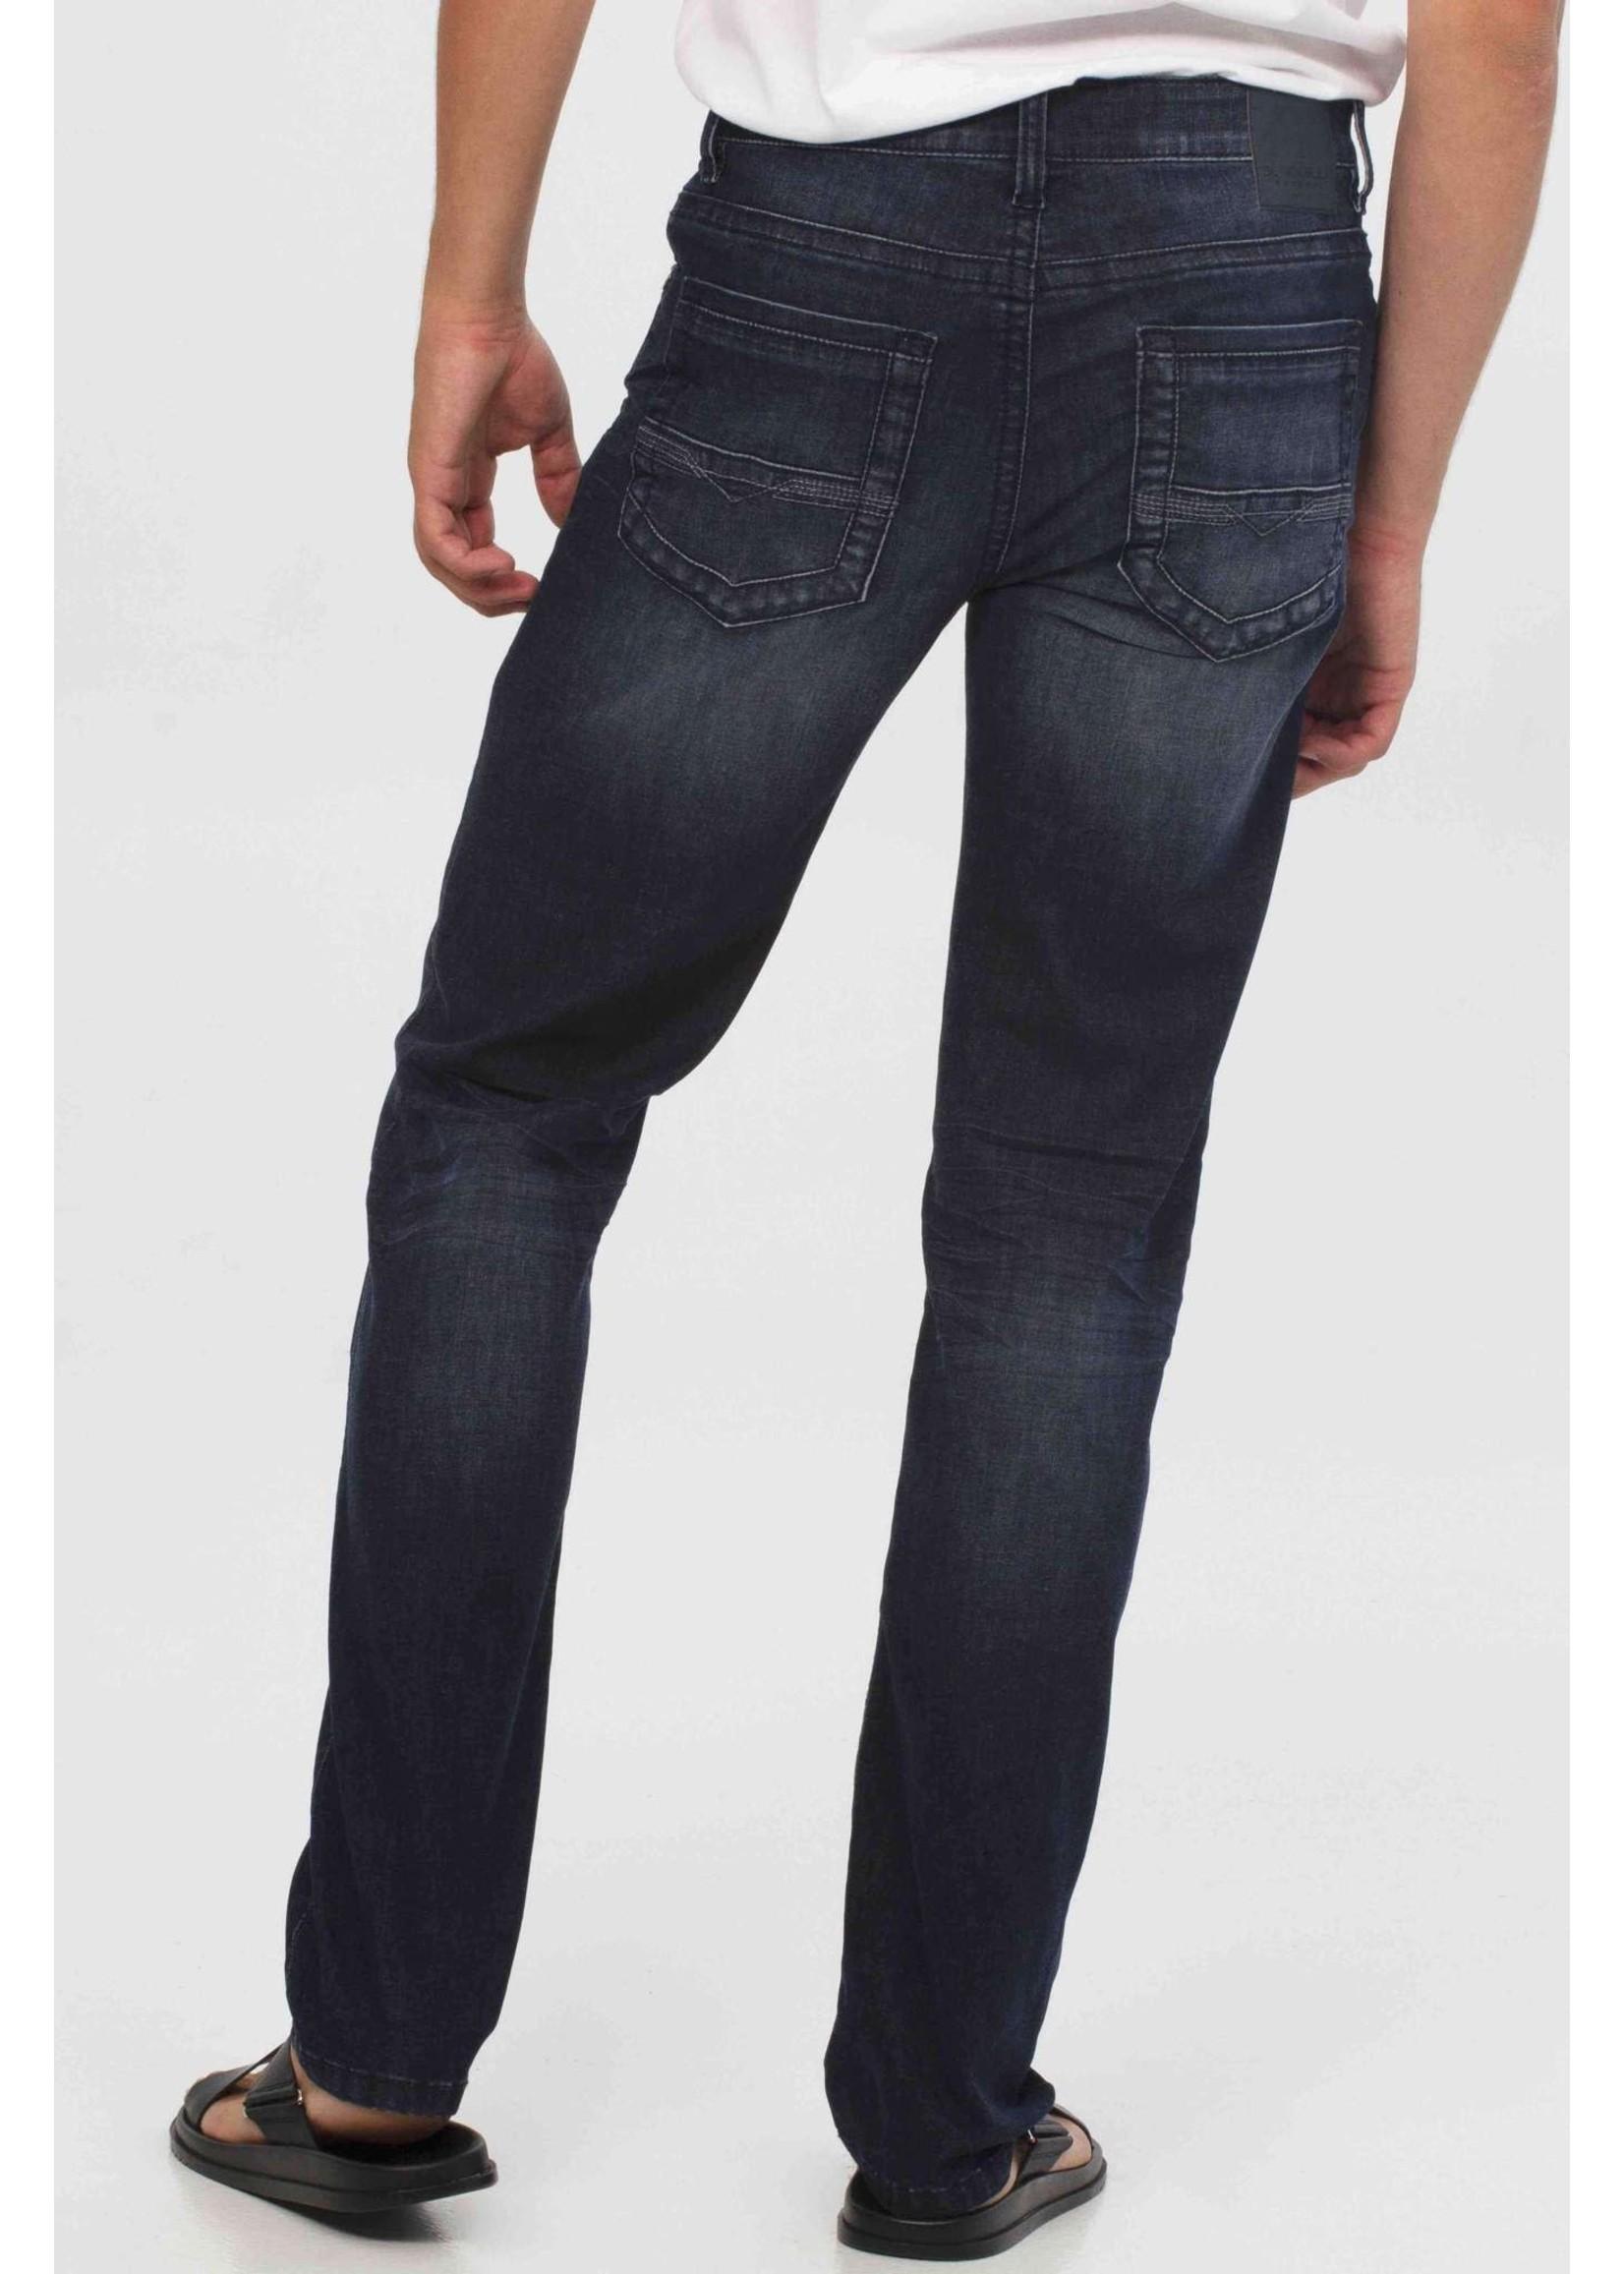 Black Bull Apparel Black Bull Apparel Jeans   Mad